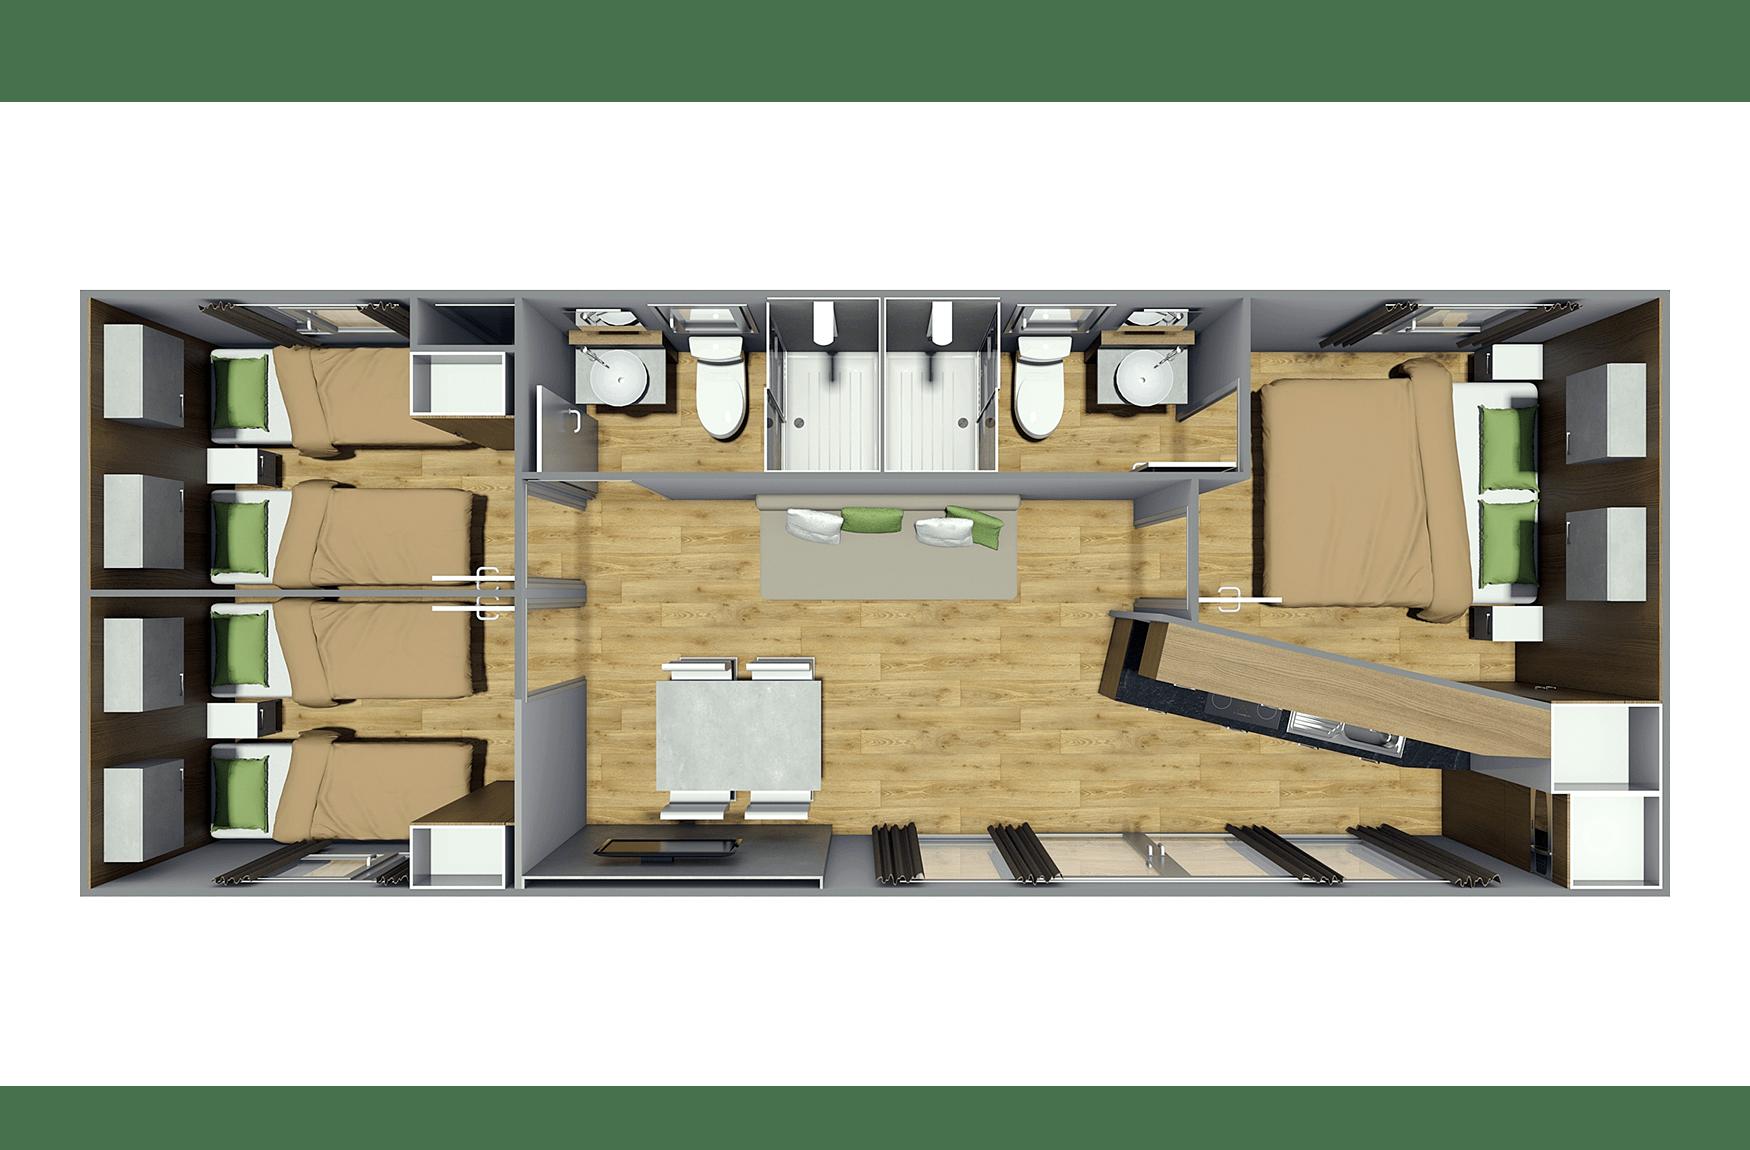 Sunshine Mobile Homes >> Cr Abitare Mobile Homes Sky Series